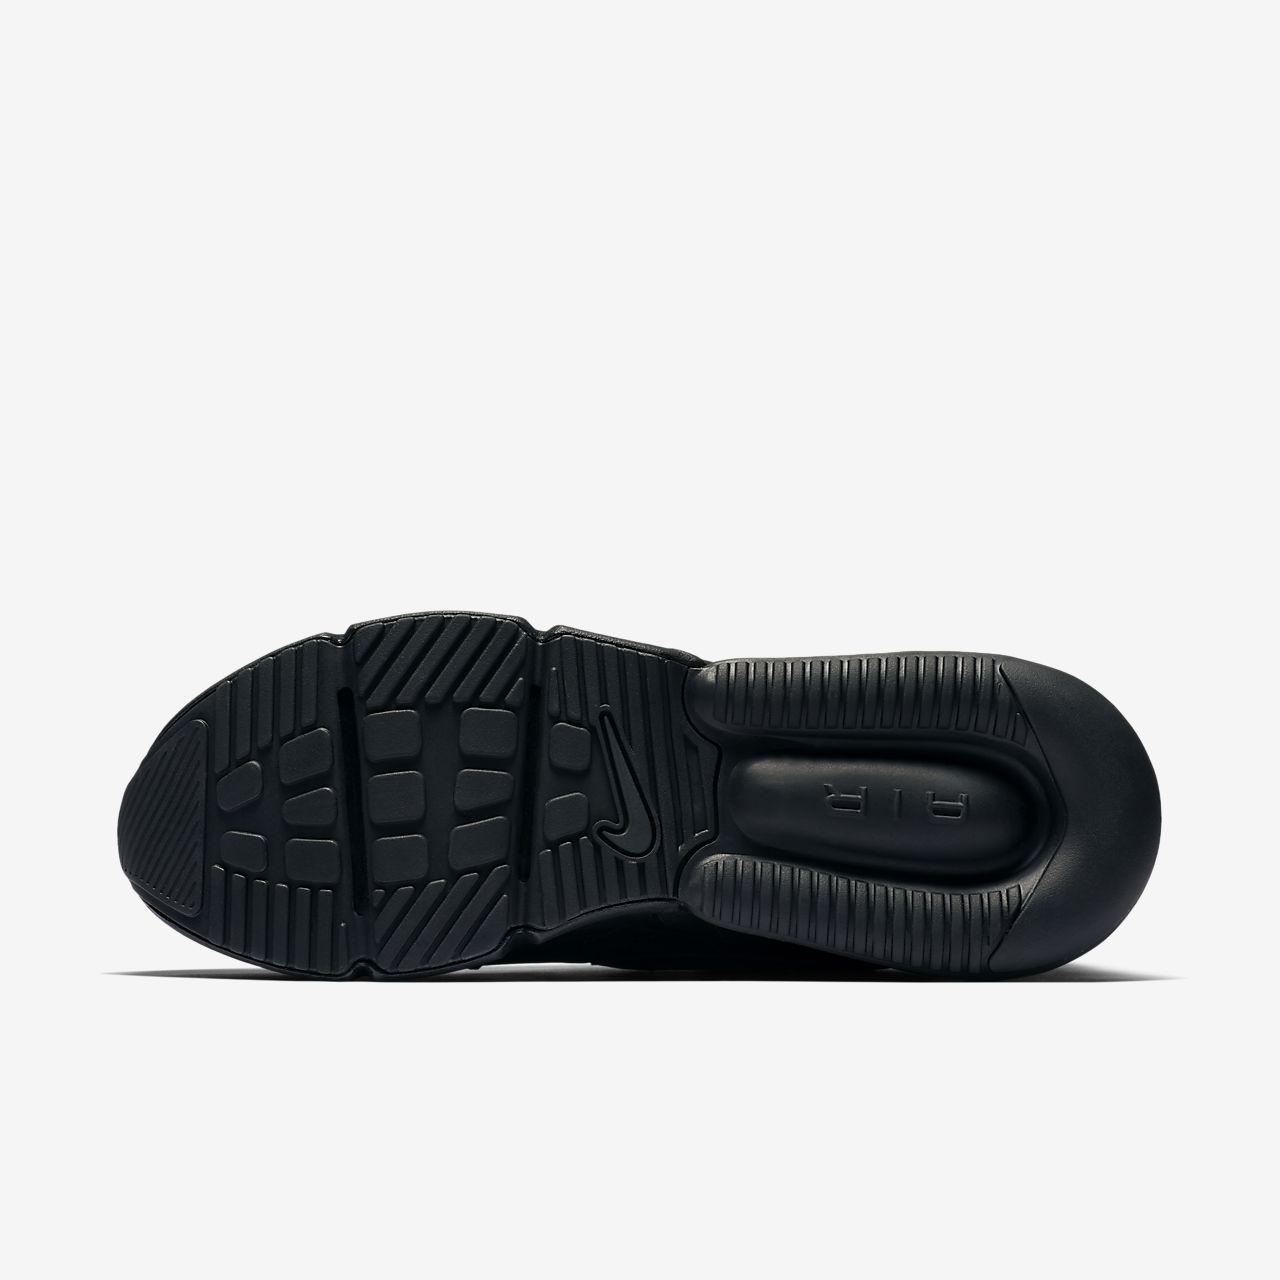 03f49a3d0a5 Nike Air Max 270 Futura Men s Shoe. Nike.com CH